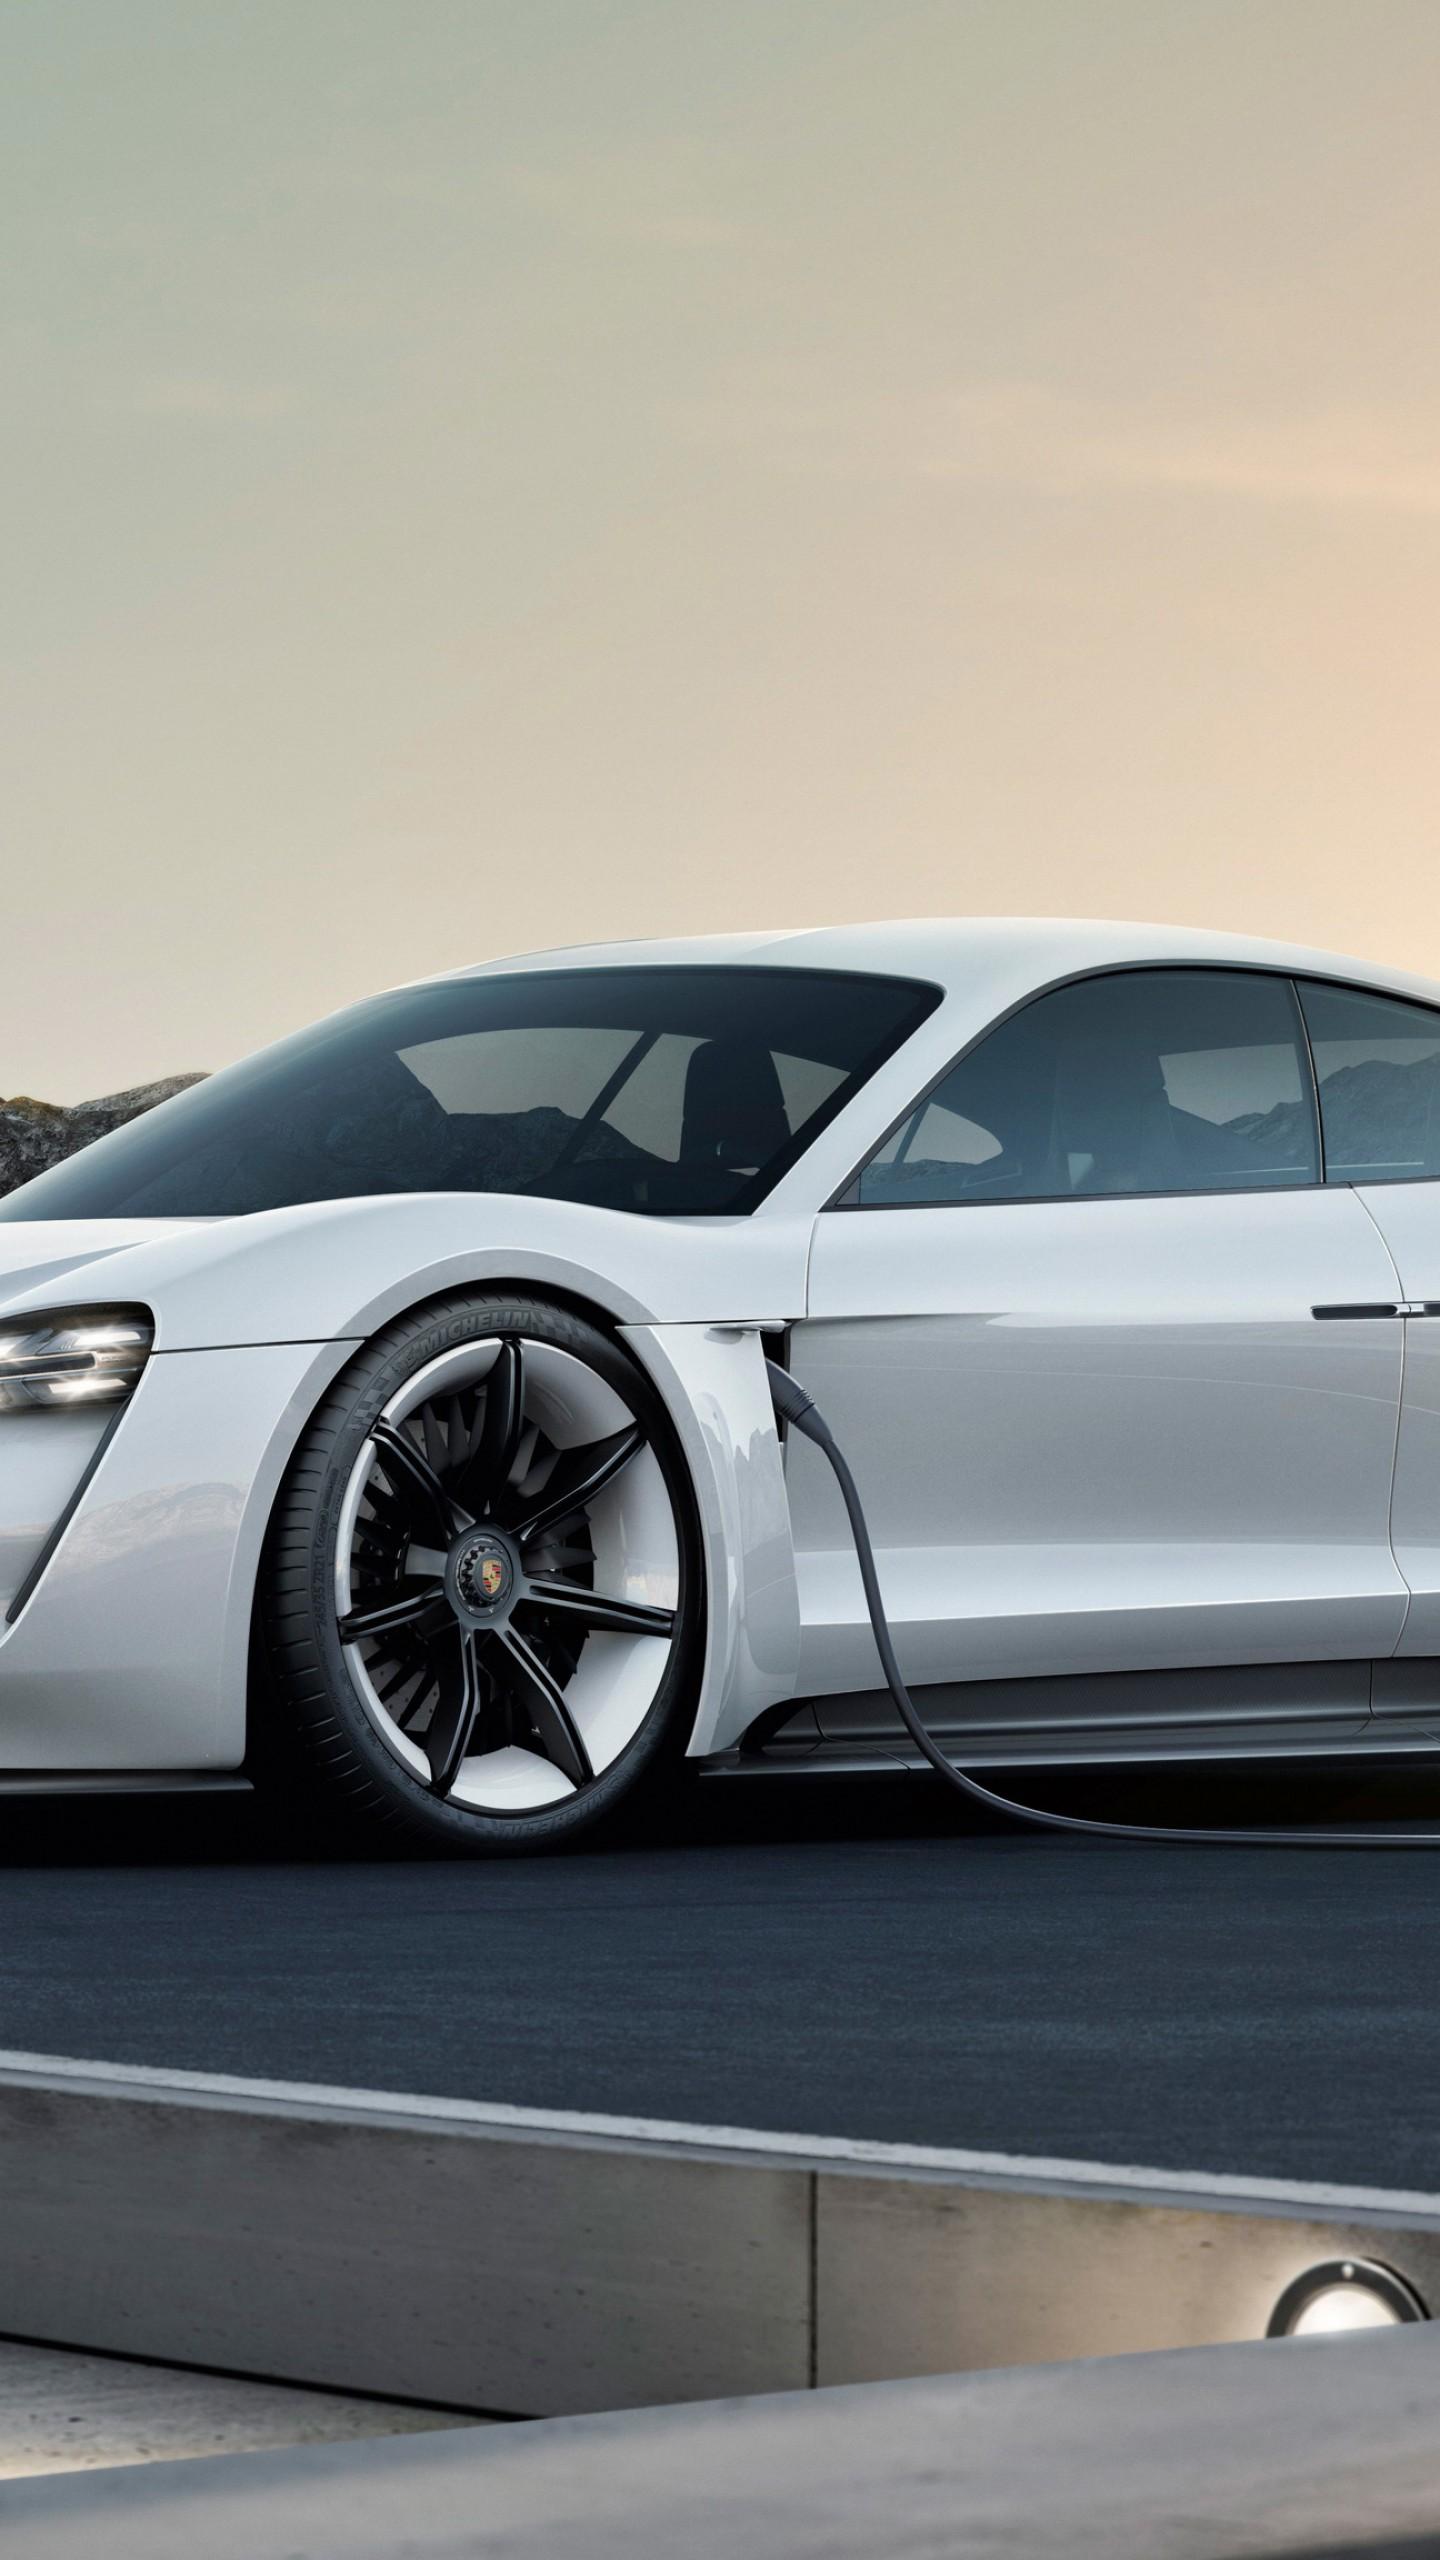 Wallpaper Porsche Taycan Electric Car supercar 2020 Cars 4K 1440x2560